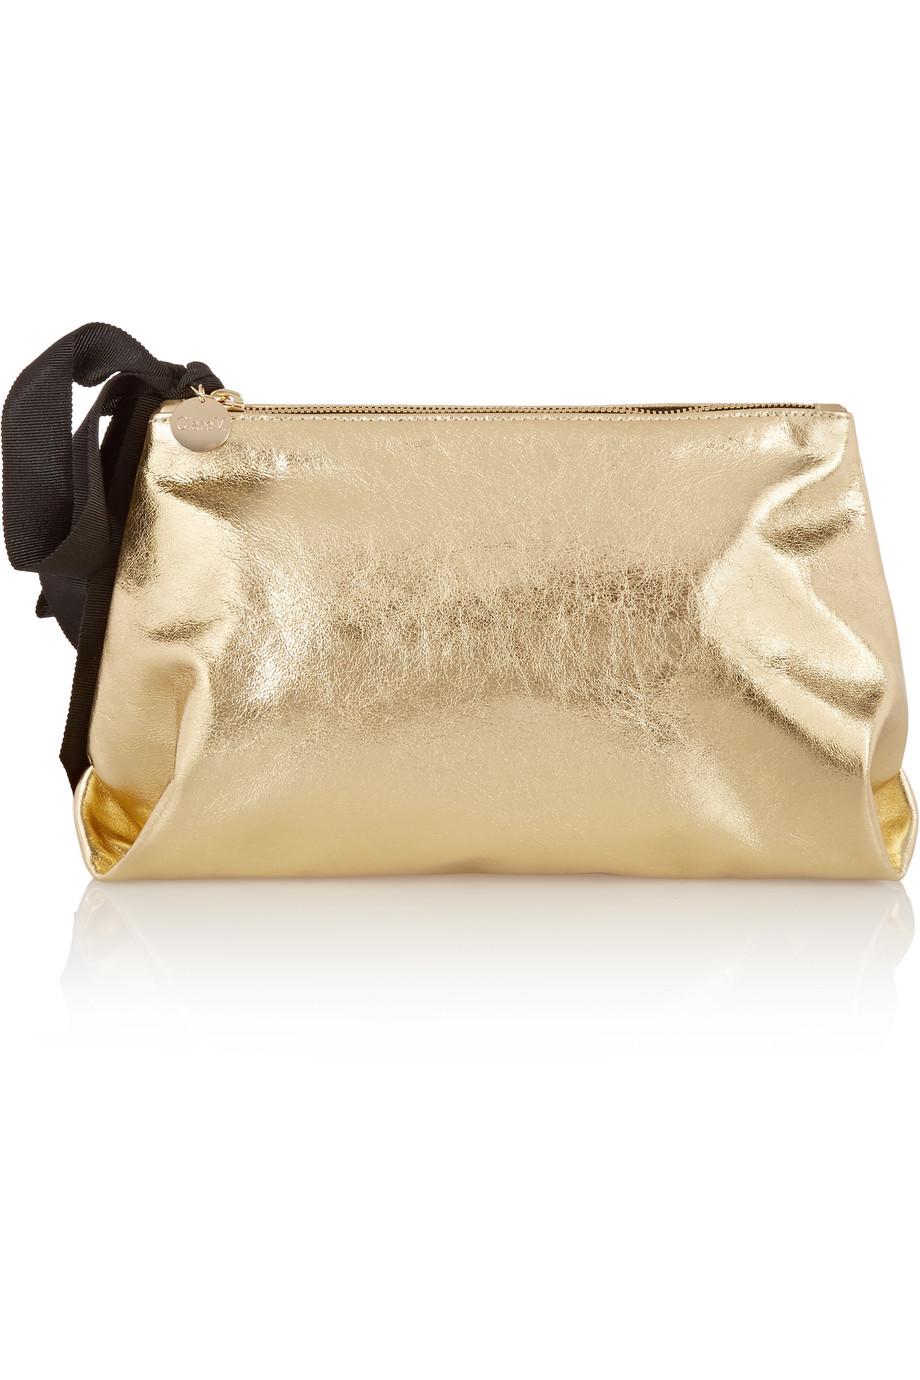 Clare V Mimi Metallic Leather Clutch, Gold, Women's